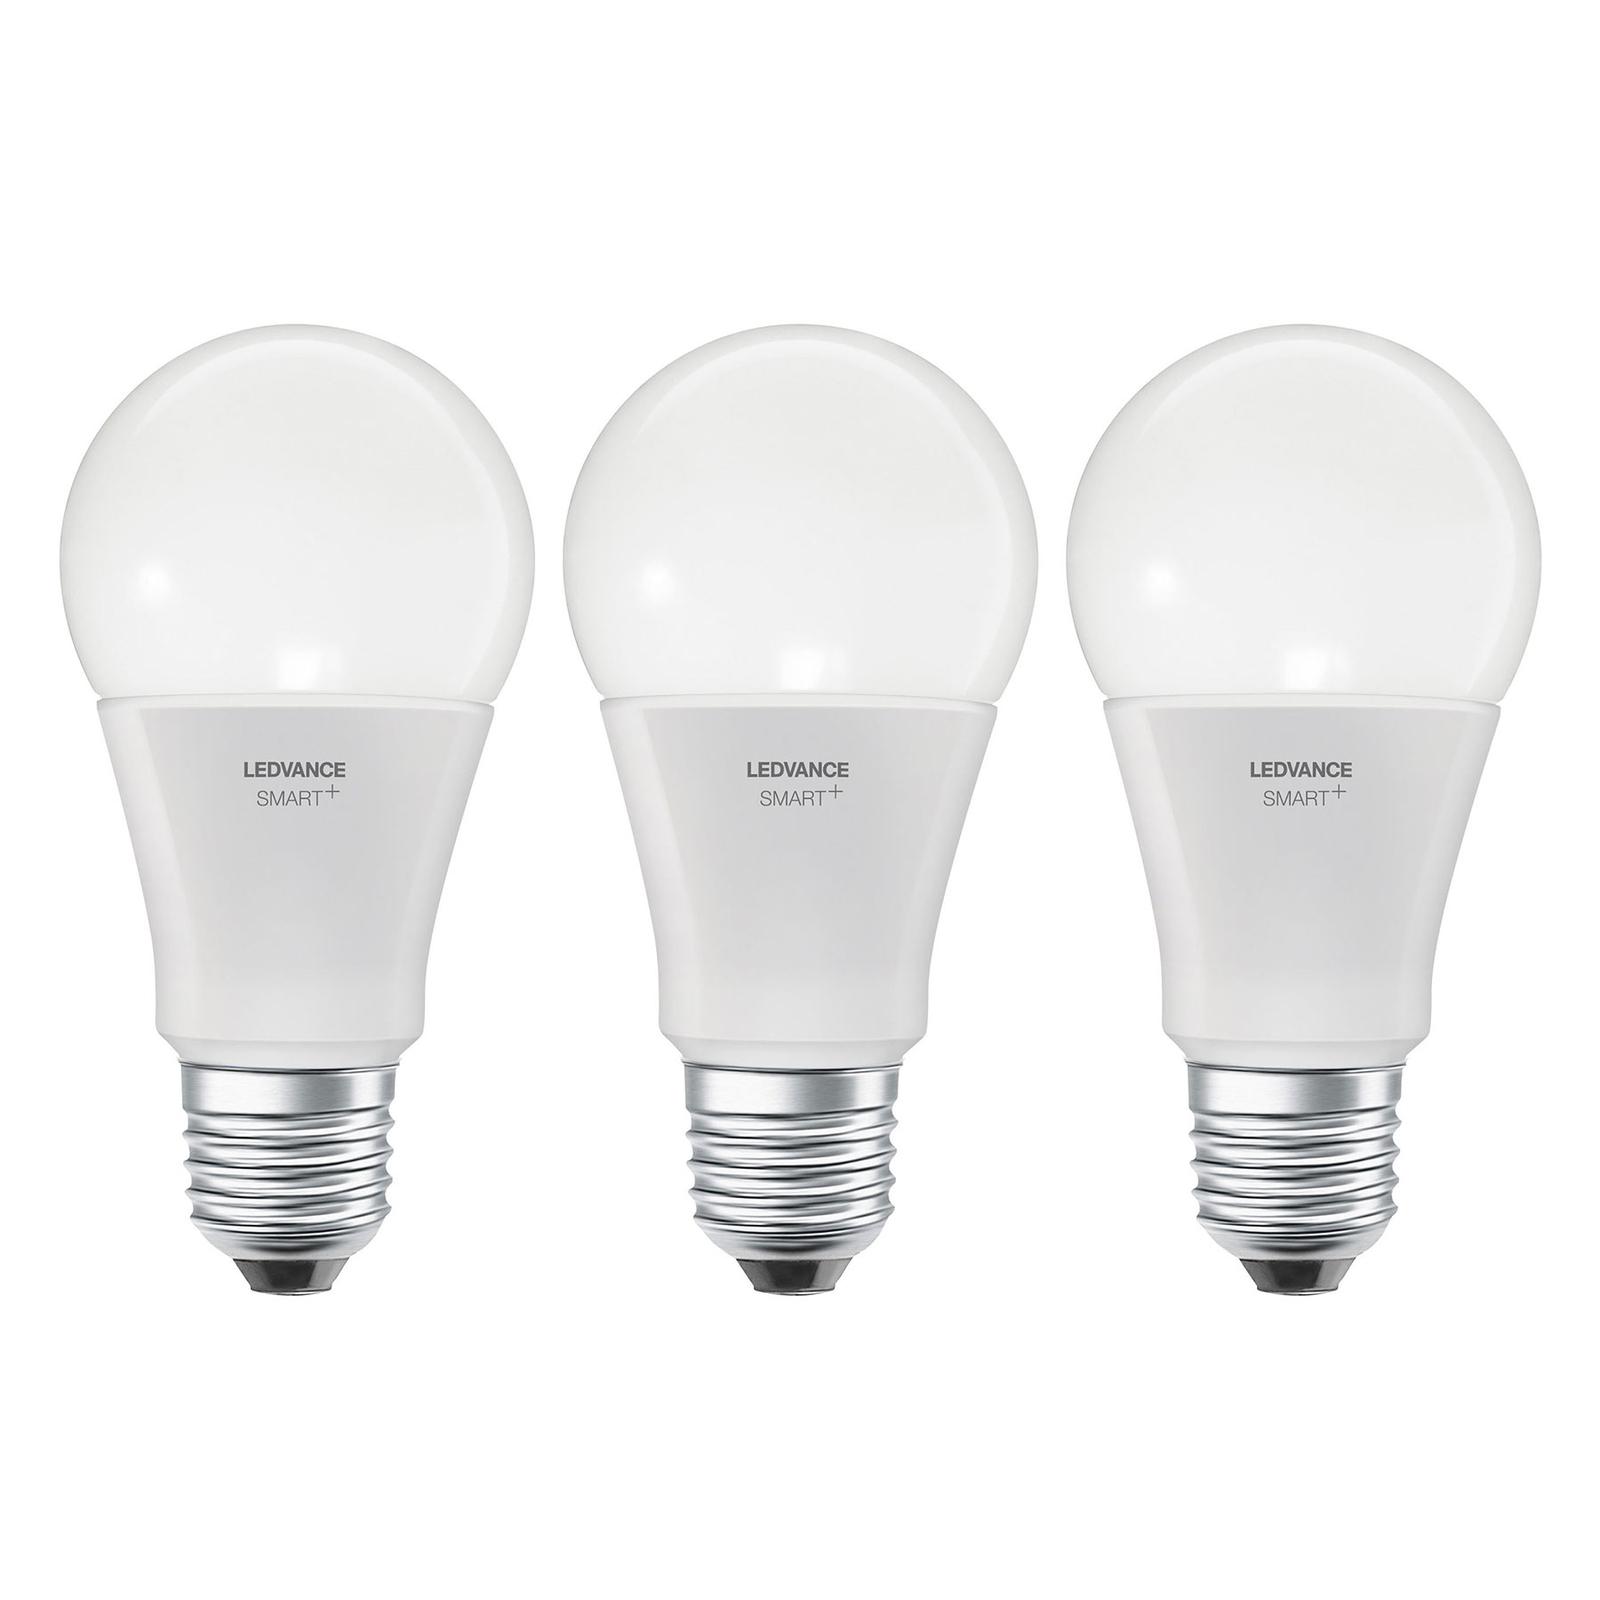 LEDVANCE SMART+ WiFi E27 14W Classic CCT 3-er